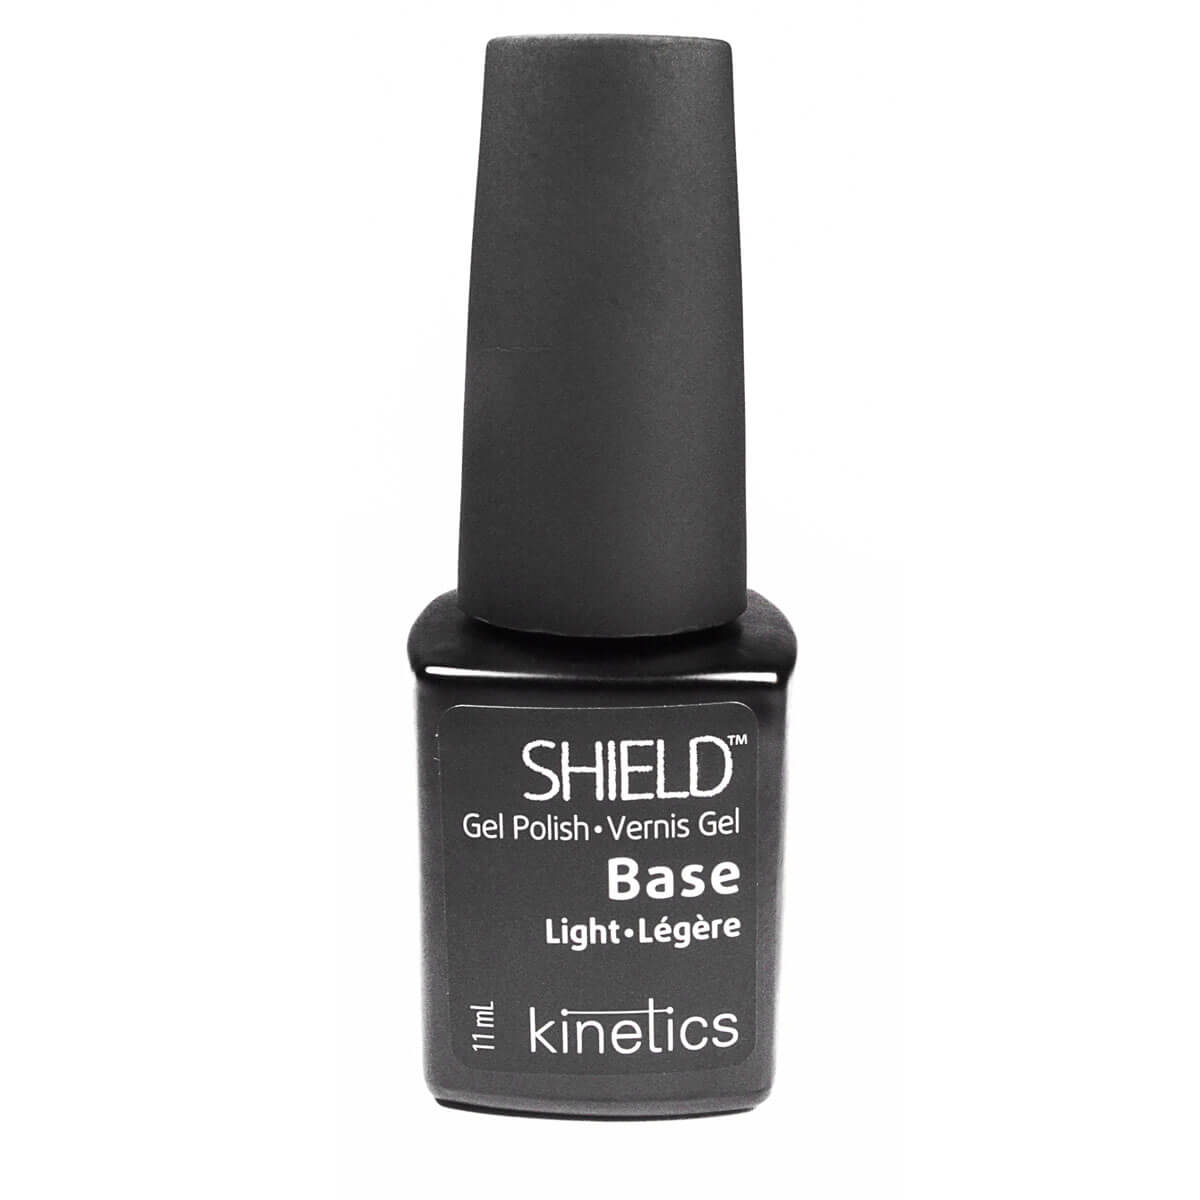 Shield Gel Polish Light Base Kinetics 11ml